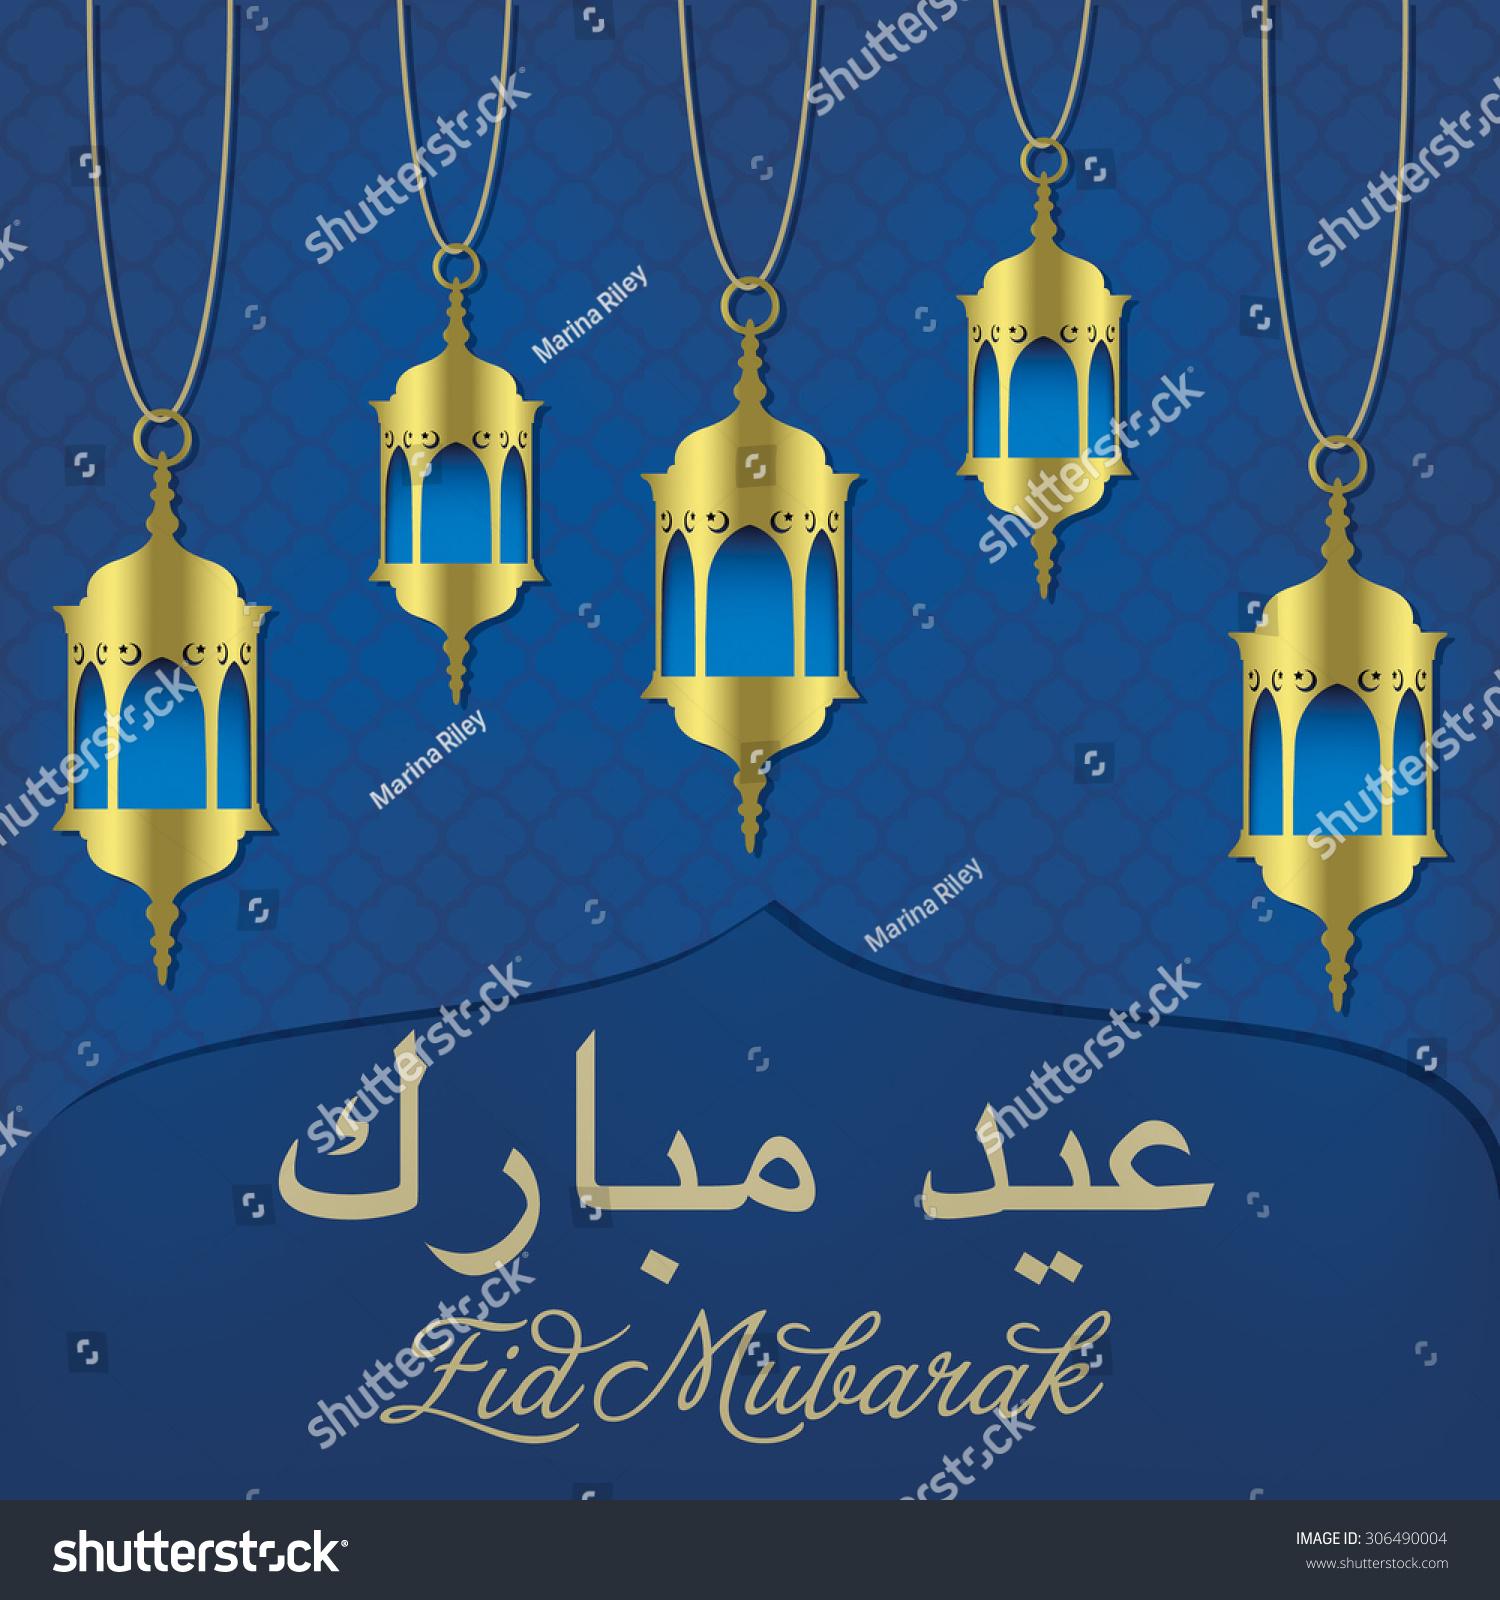 Eid mubarak blessed eid lantern greeting stock vector 306490004 eid mubarak blessed eid lantern greeting card in vector format kristyandbryce Image collections